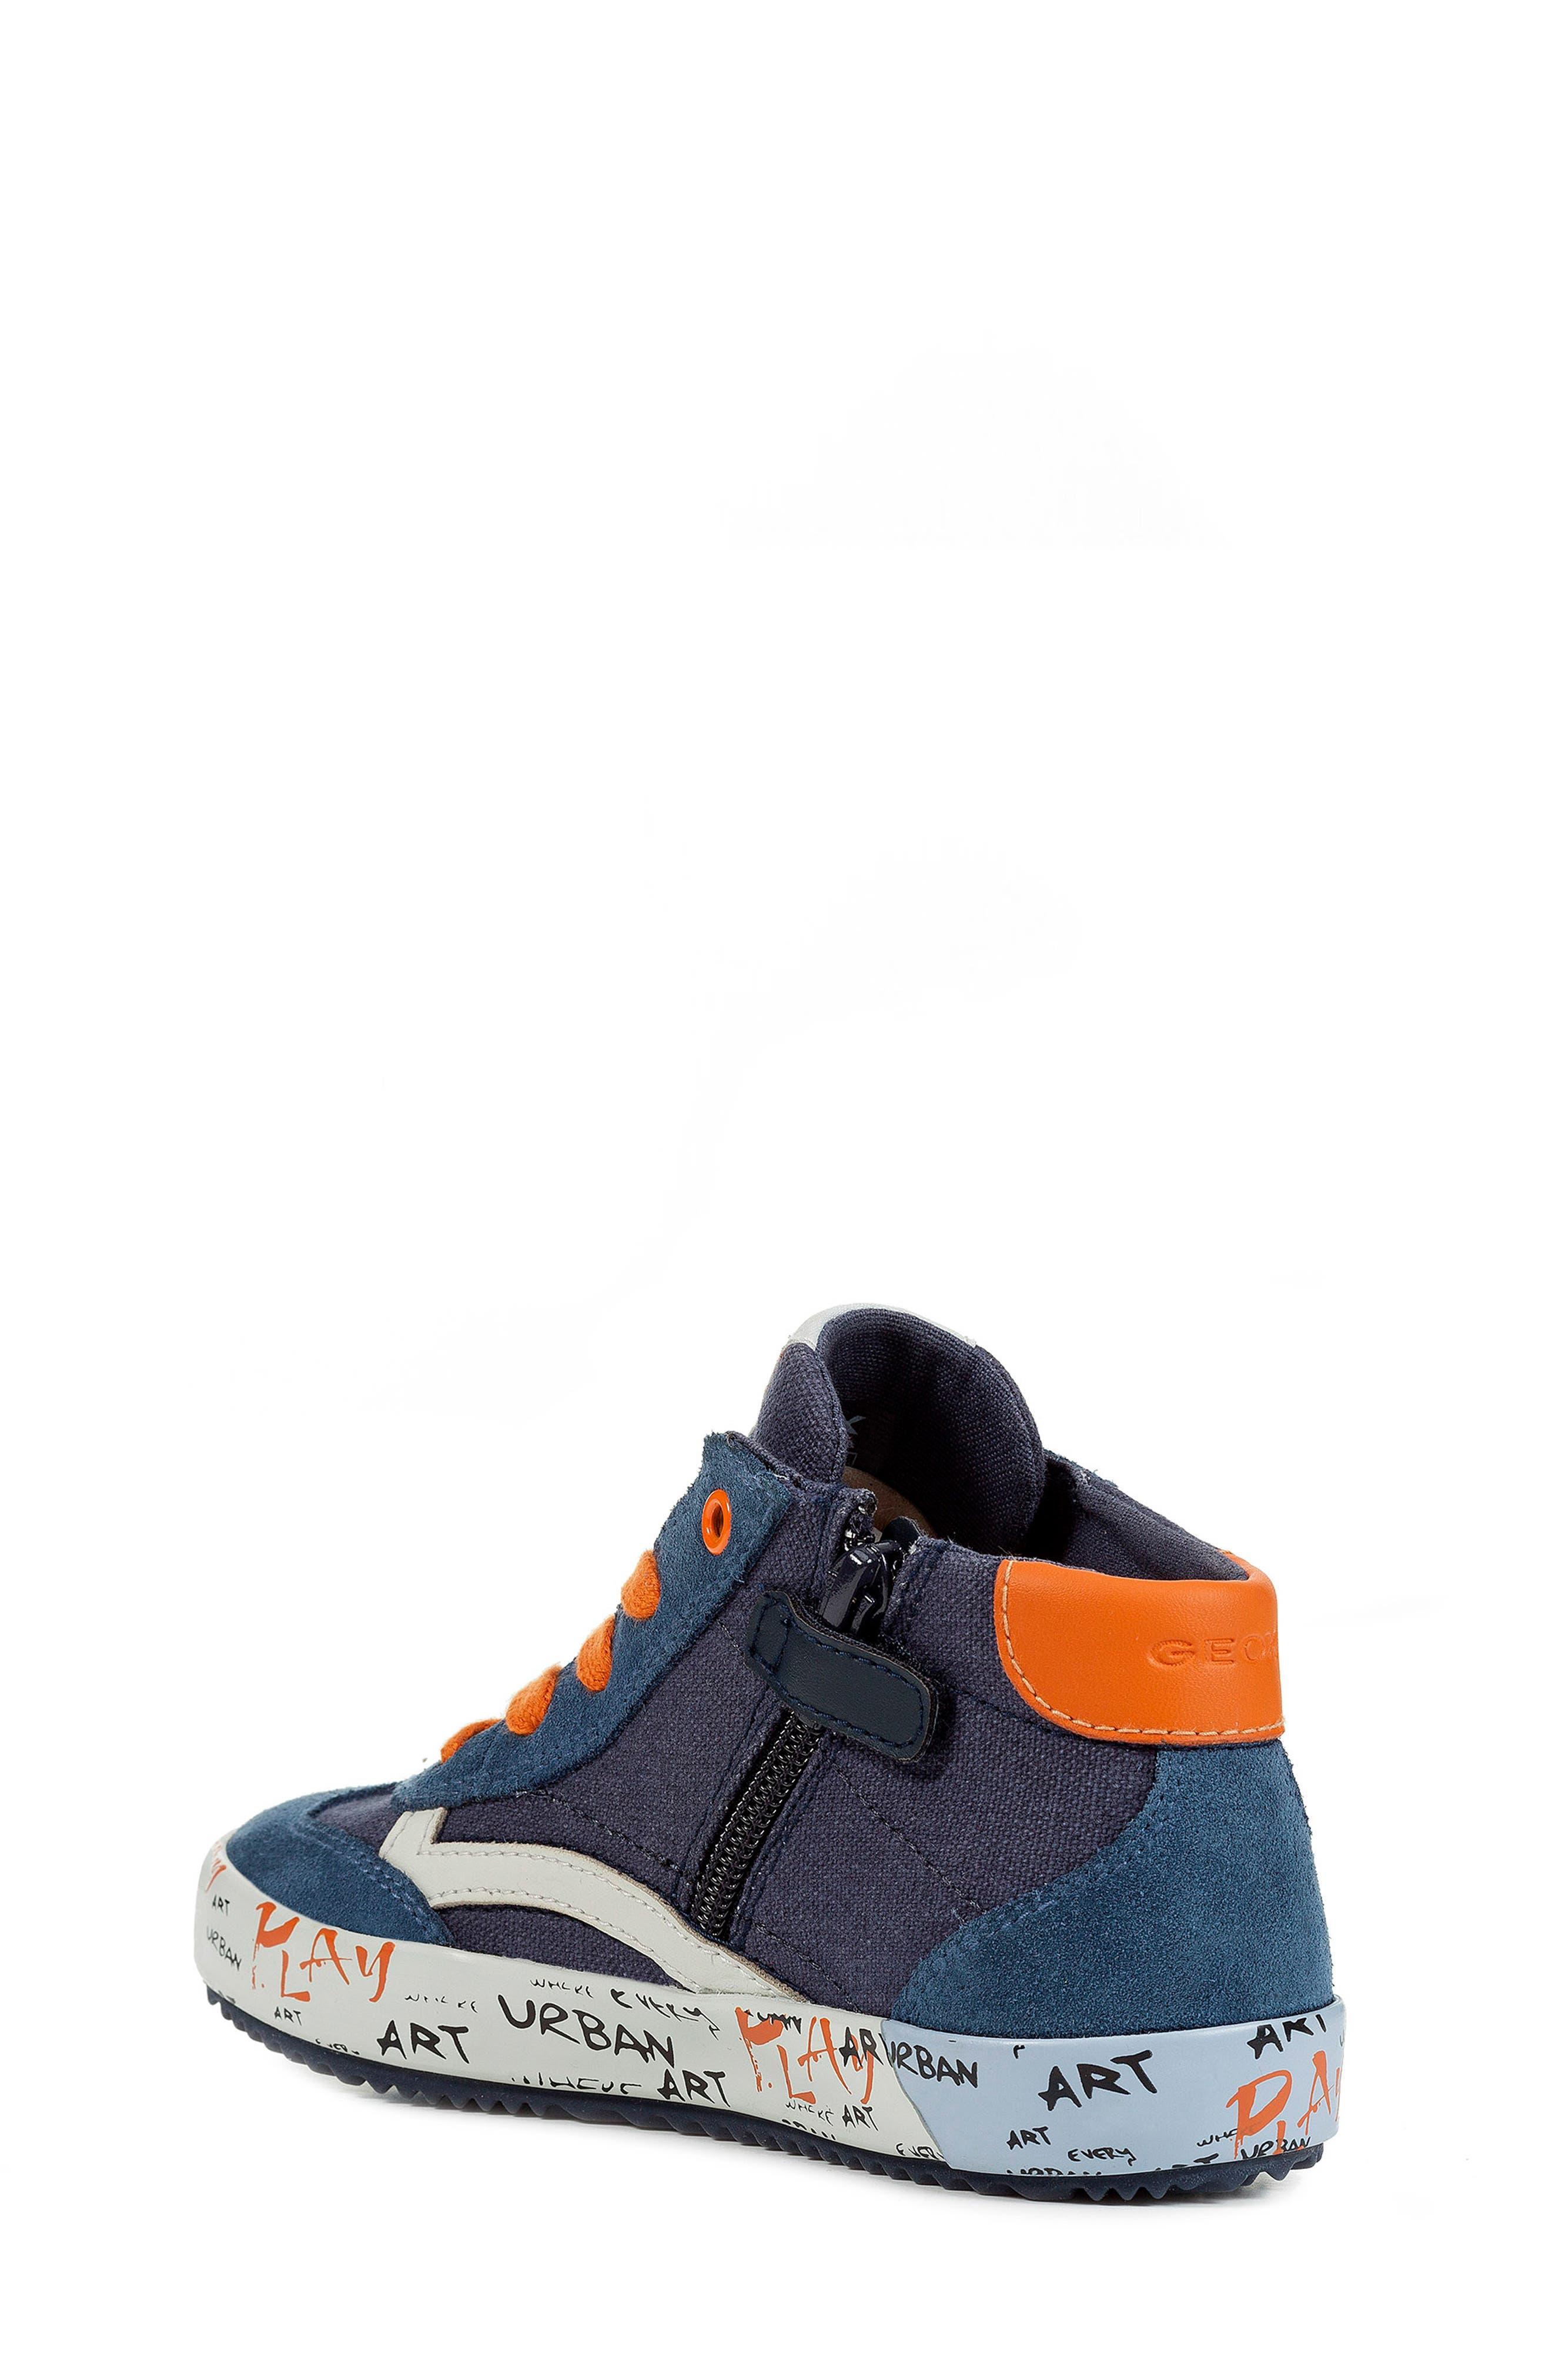 Alonisso 34 High Top Sneaker,                             Alternate thumbnail 2, color,                             NAVY/ DARK ORANGE